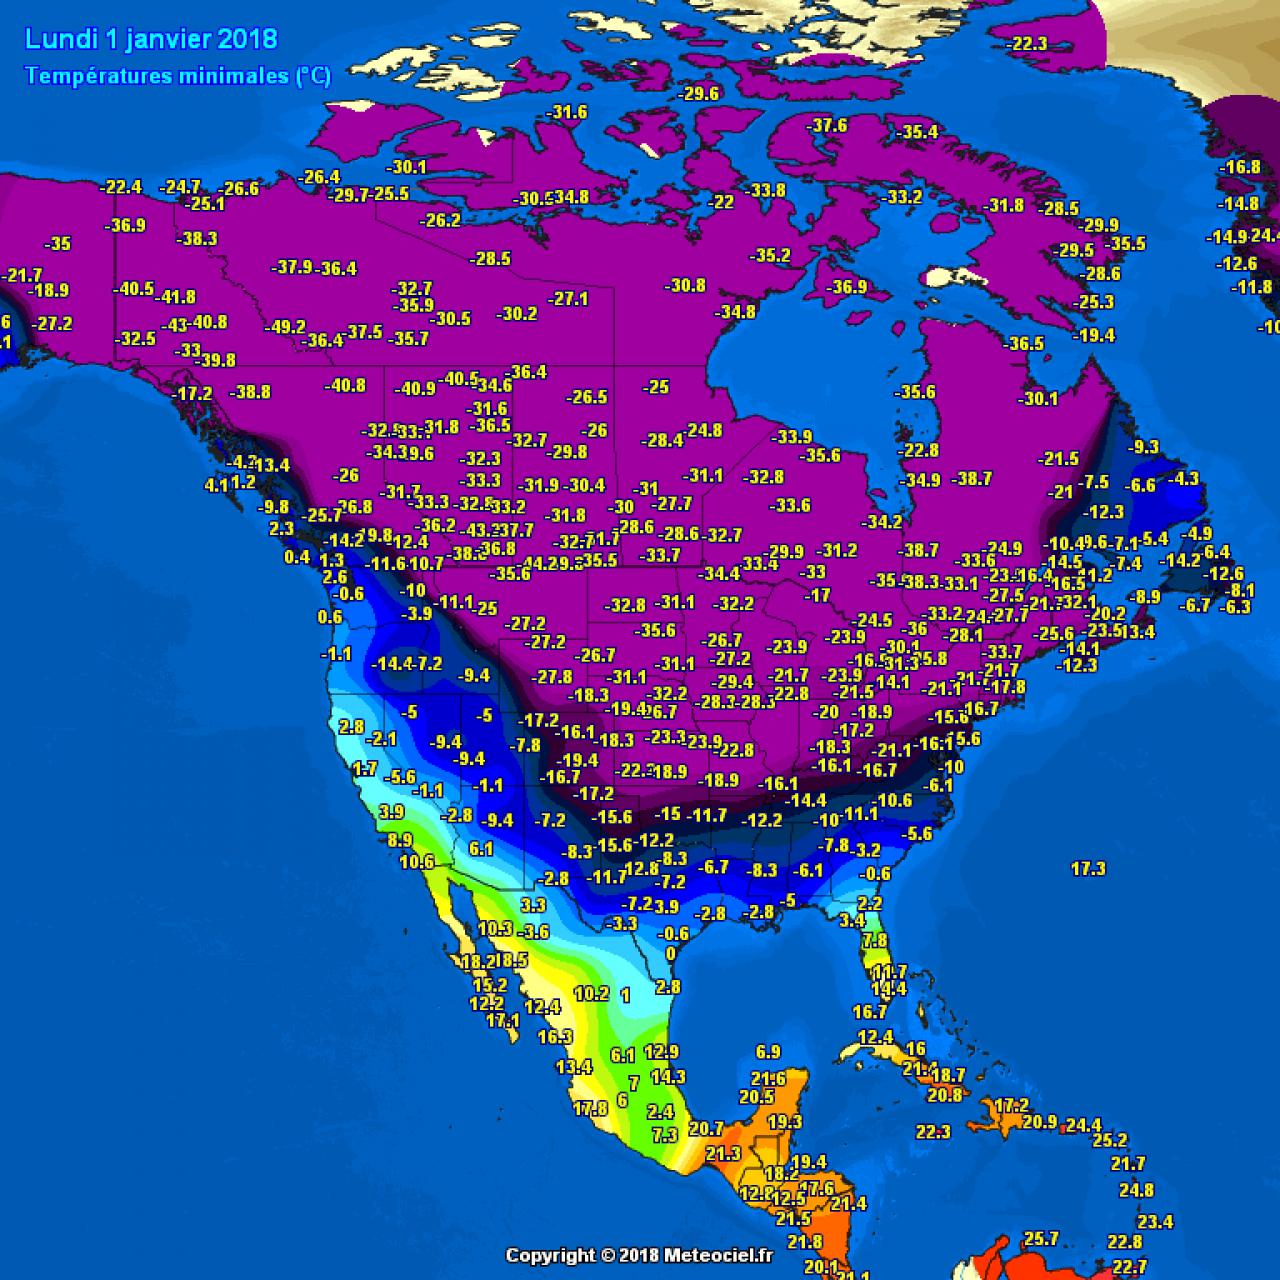 temperature minime registrare 2 gennaio fonte meteociel fr 3bmeteo 81483